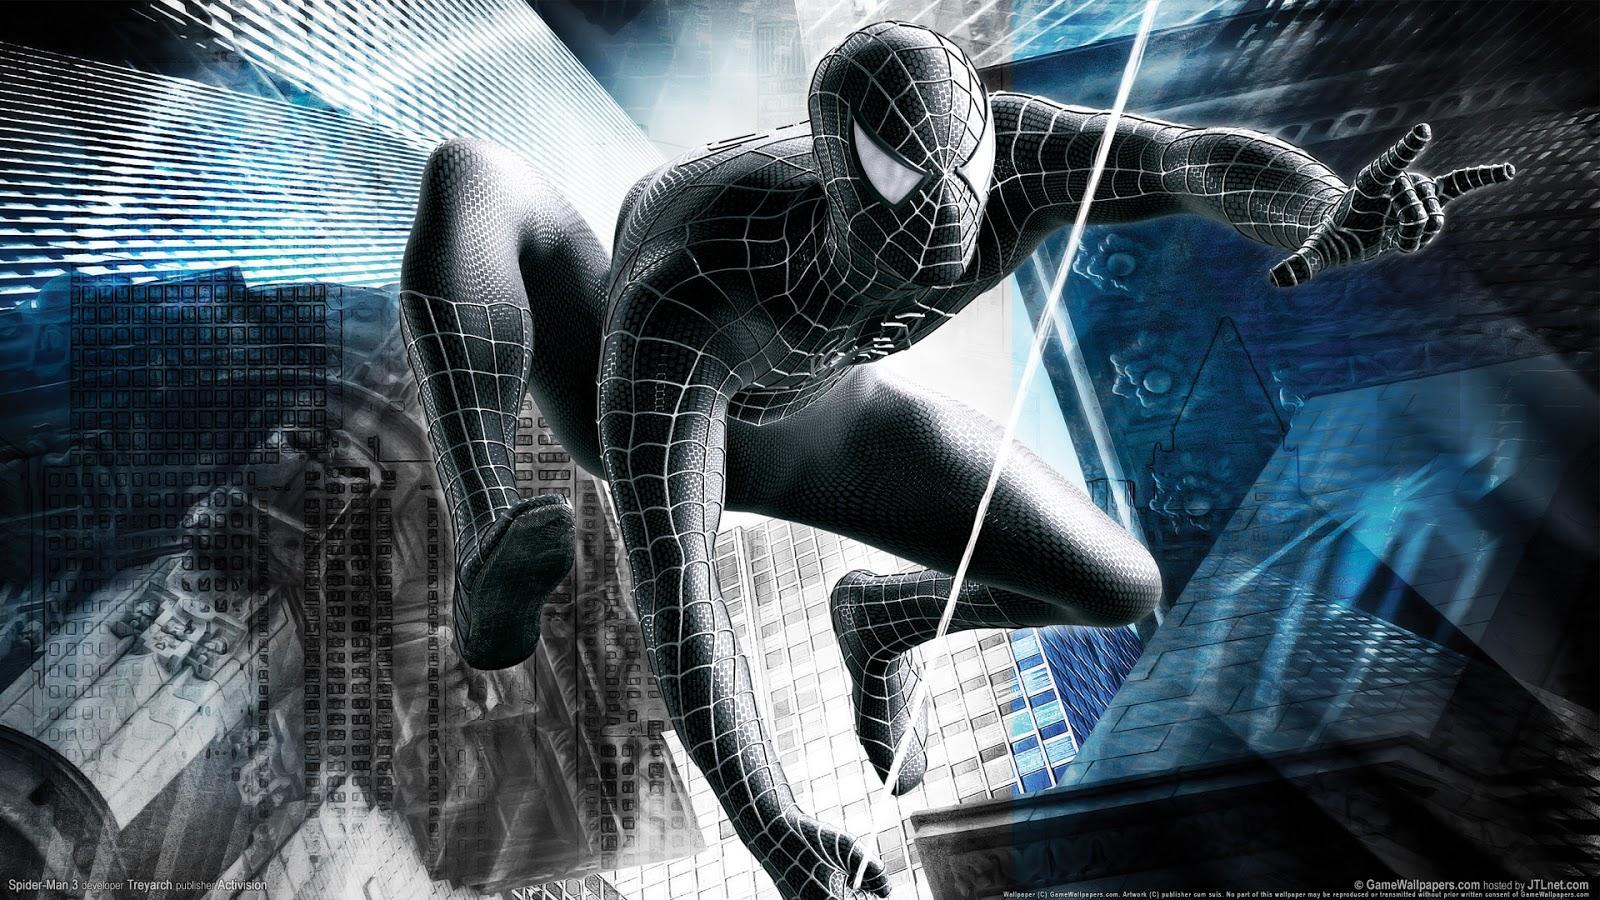 Download Amazing Spiderman 3 Wallpaper